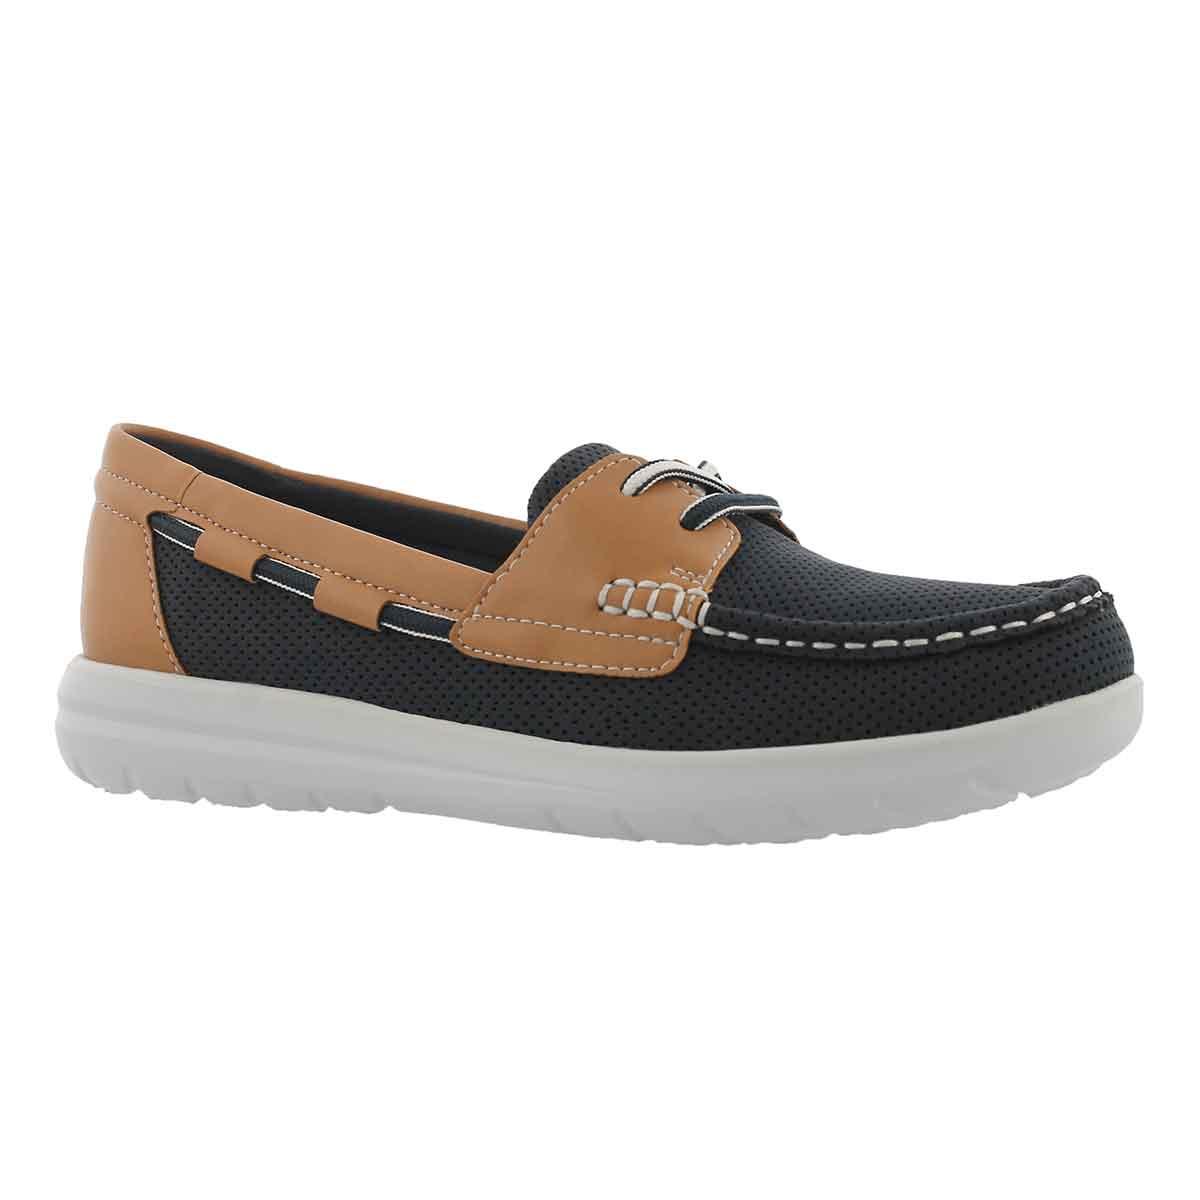 Women's JOCOLIN VISTA navy boat shoes